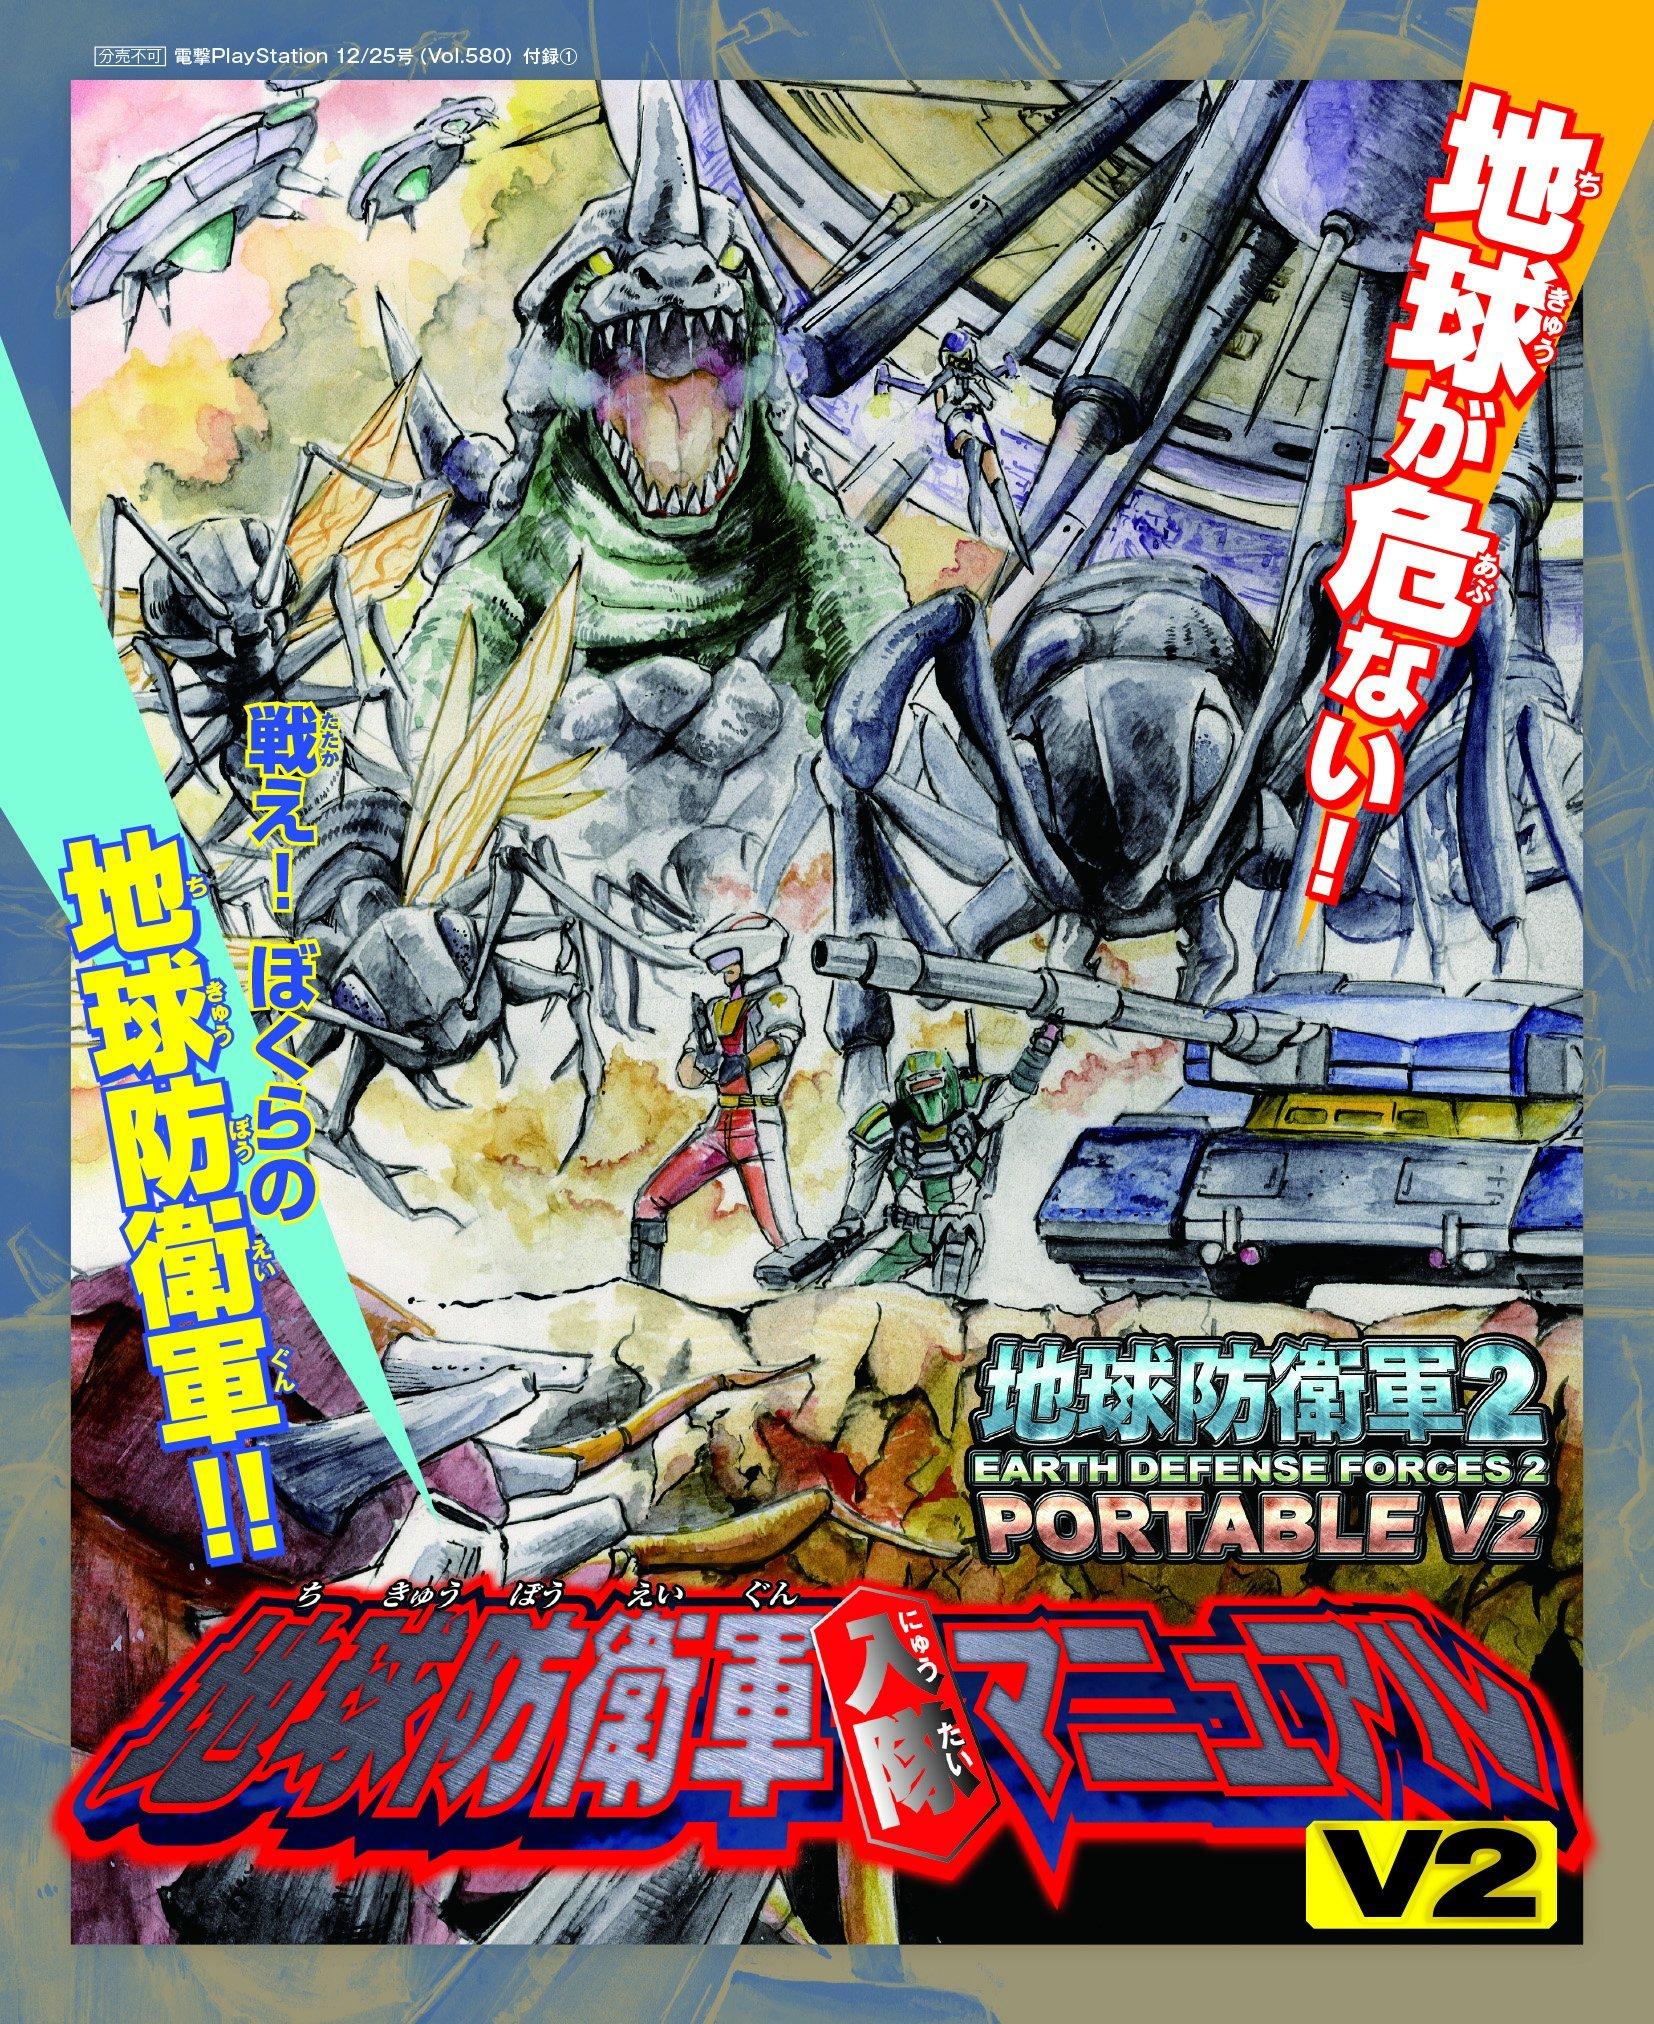 Earth Defense Forces 2 Portable V2 Enlistment Manual (Vol.580 supplement) (December 25, 2014)